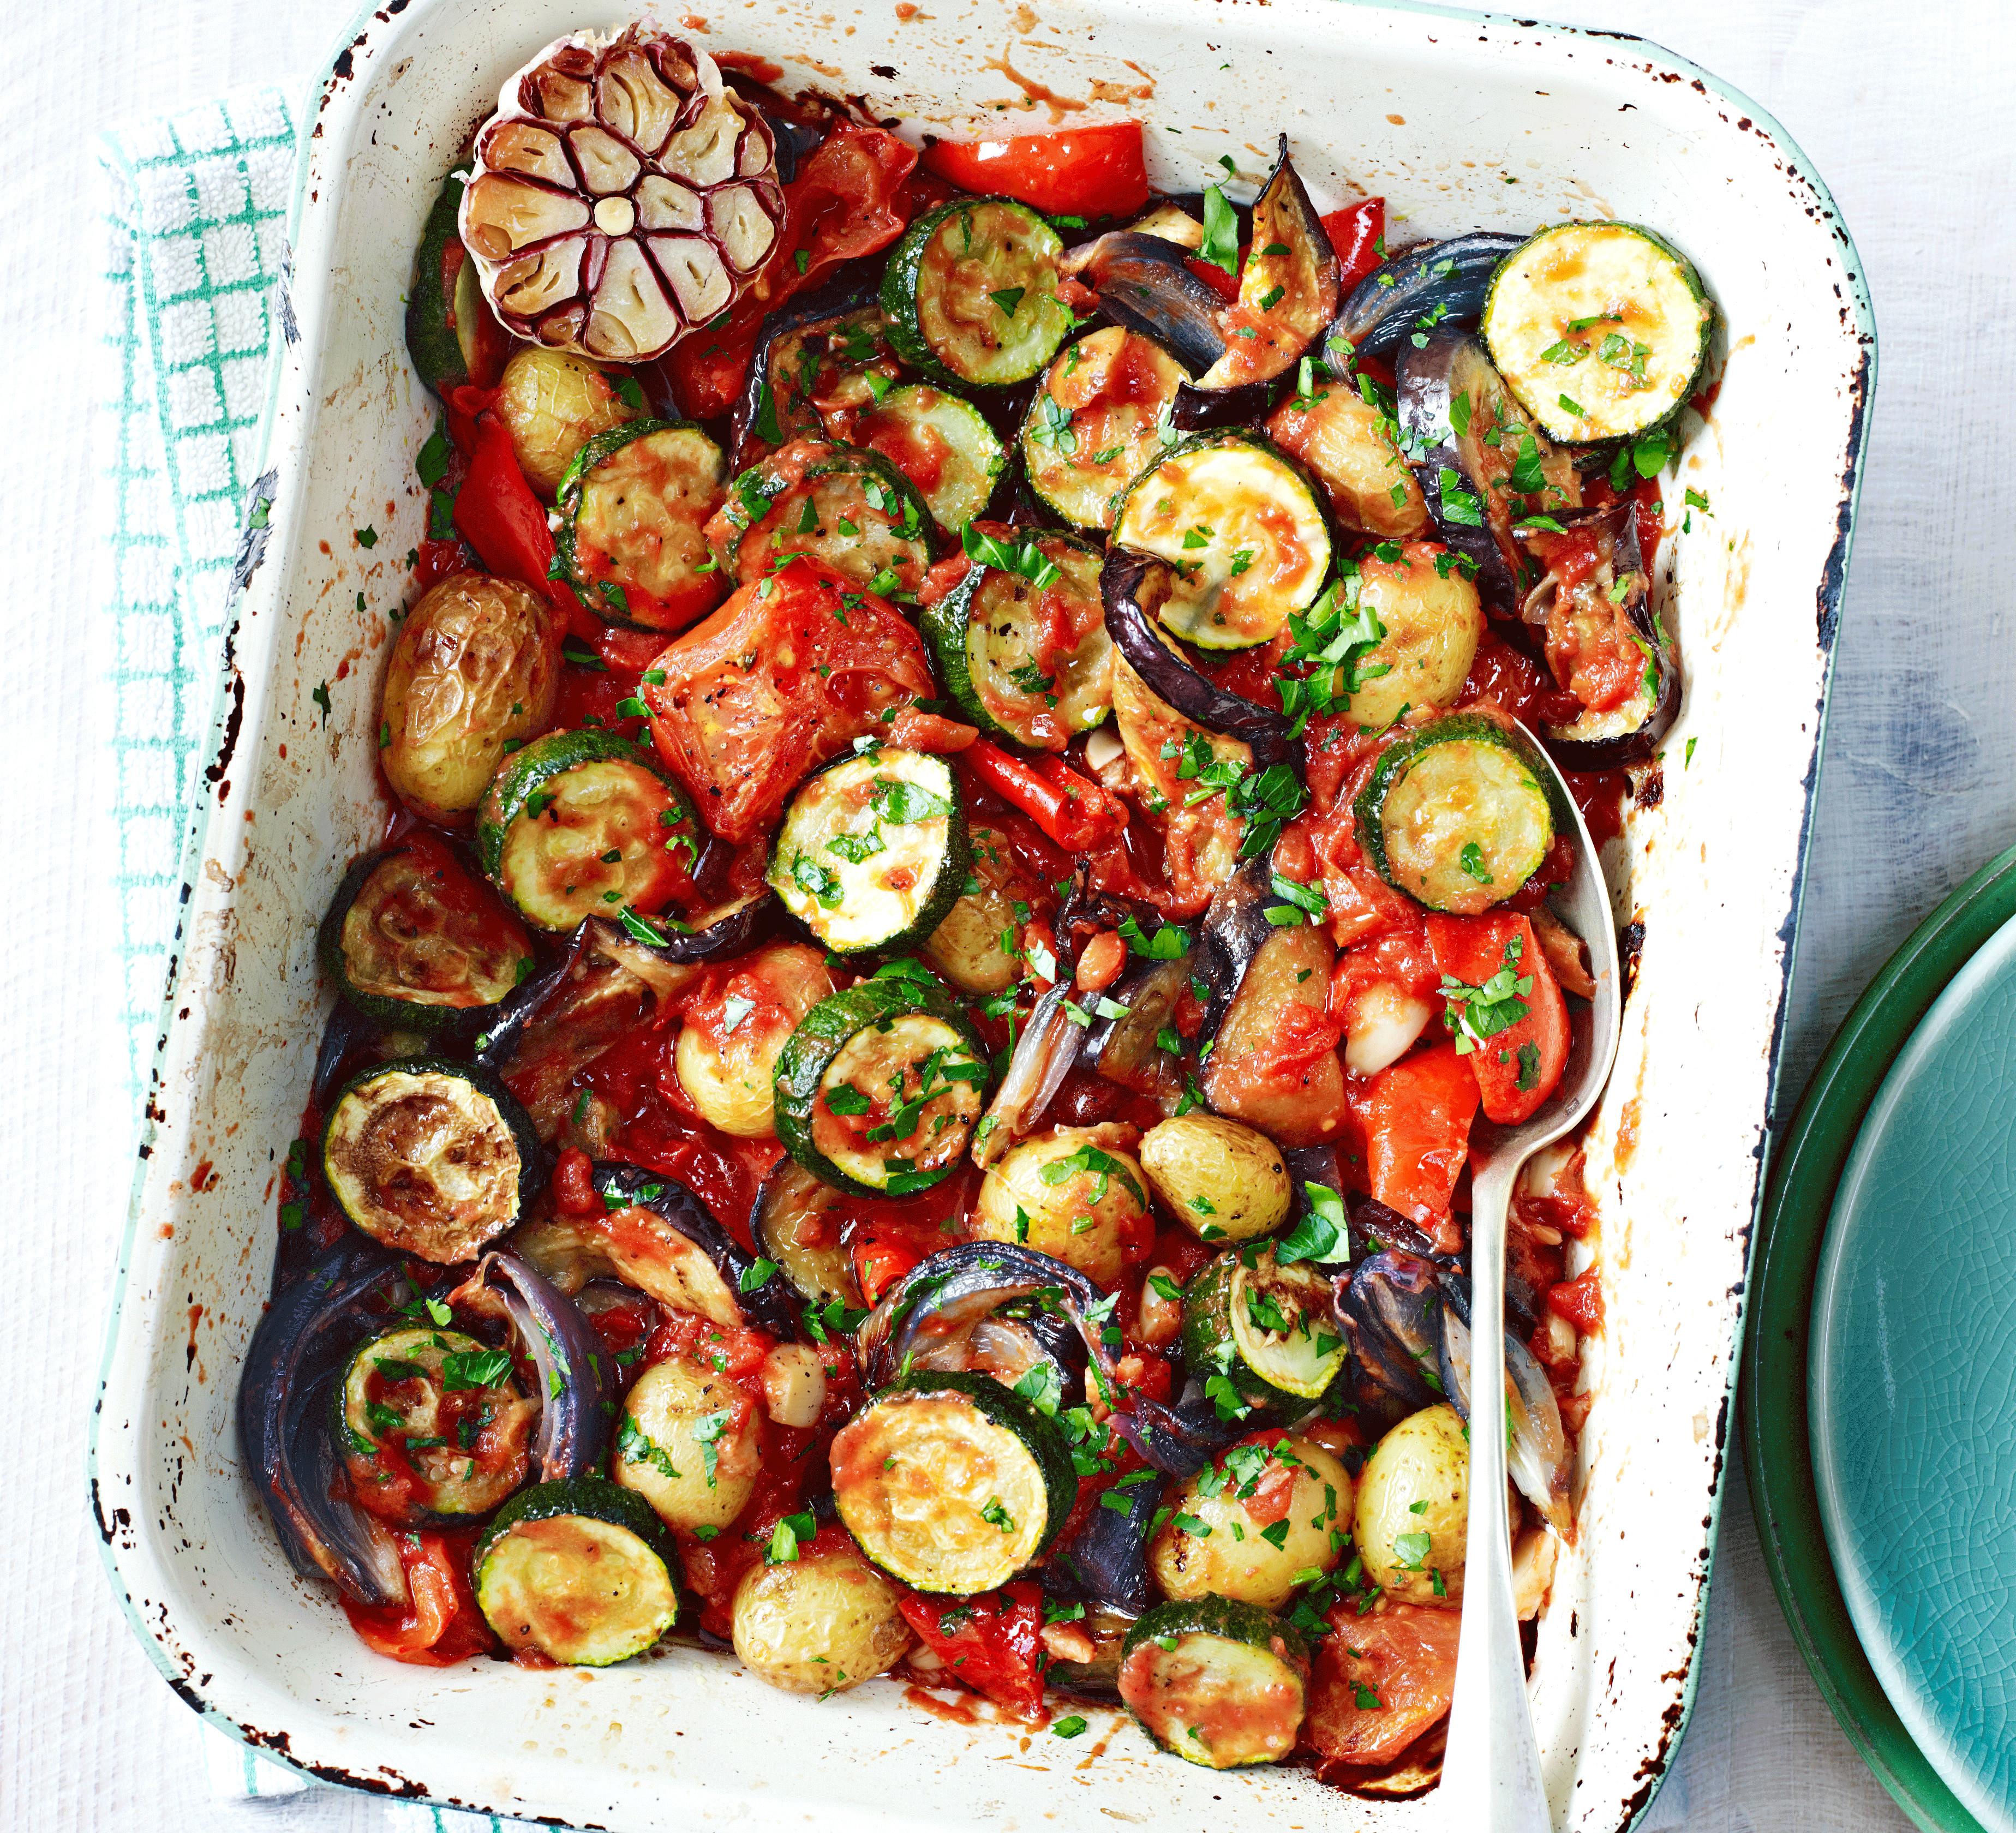 Roasted Summer Vegetables  Roasted summer ve able casserole